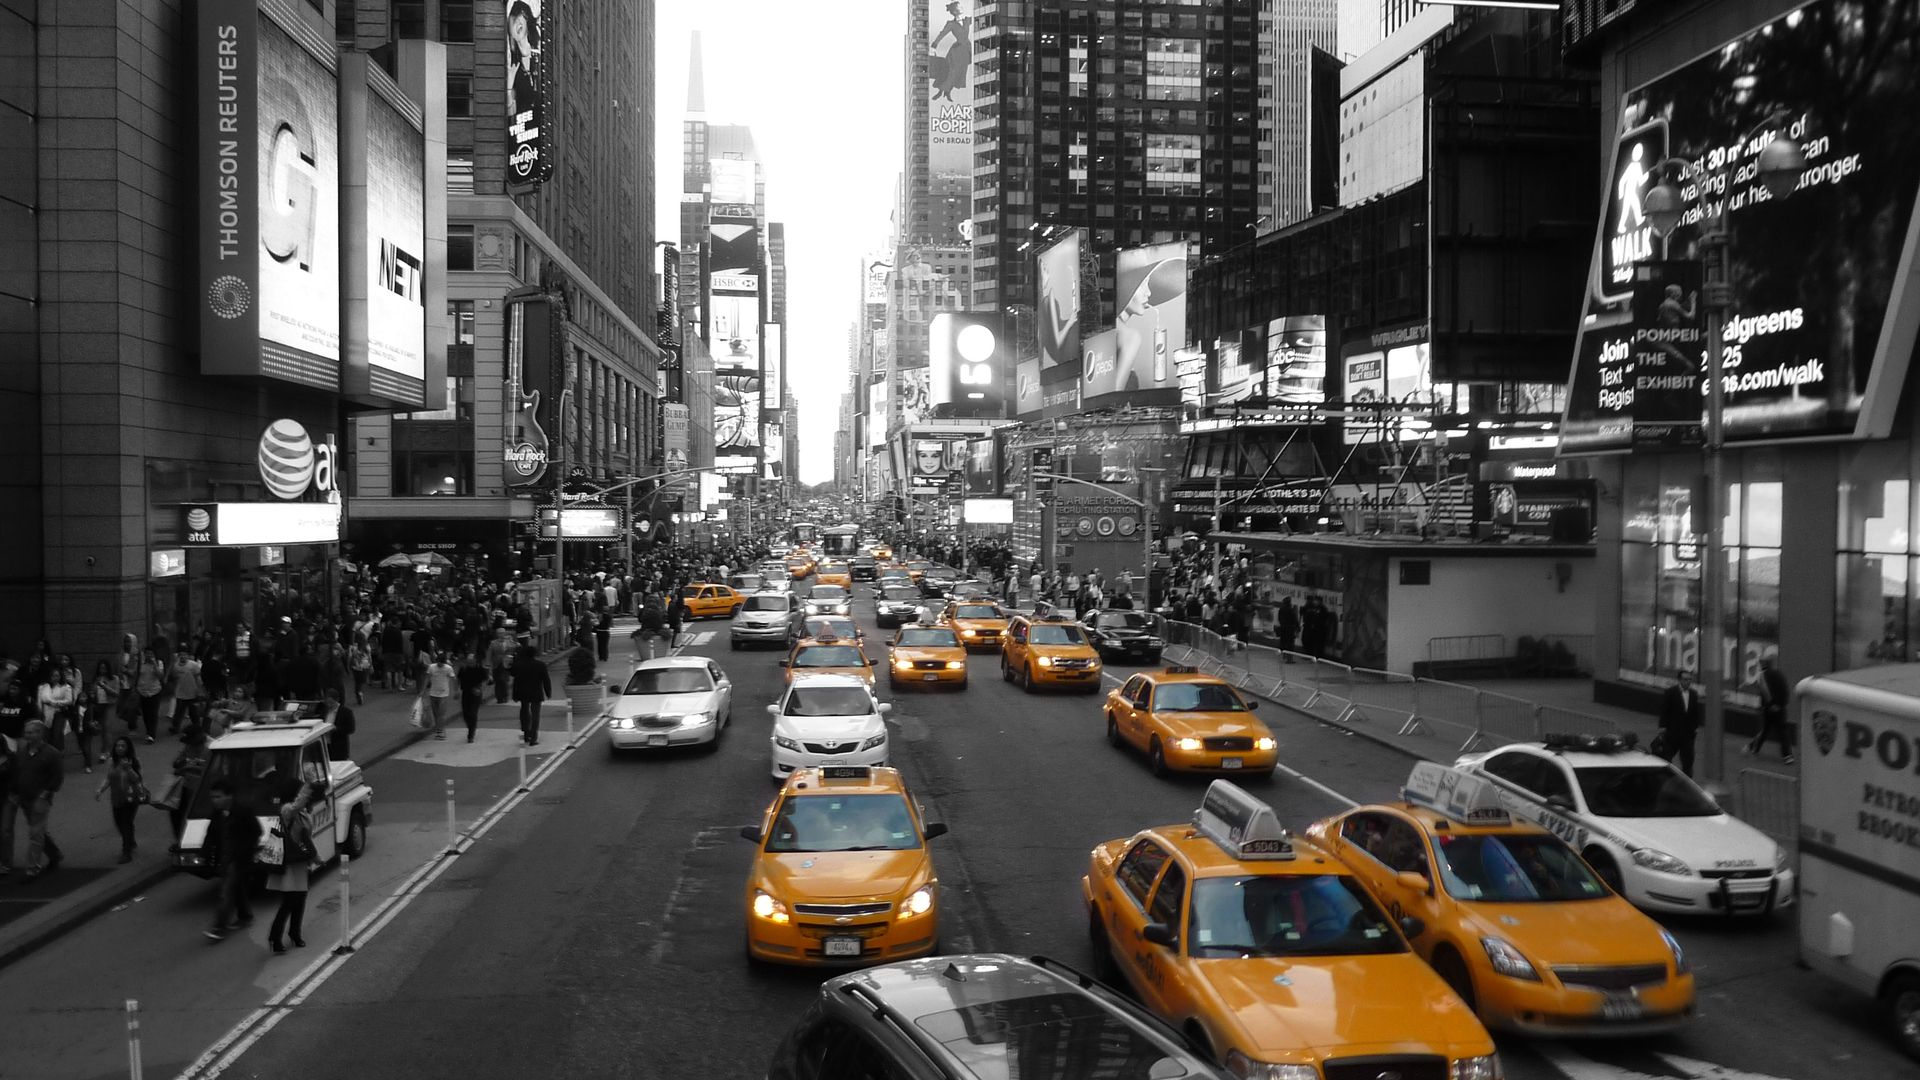 New York City Street Black And White Wallpaper Yellow Taxi New York Wallpaper New York City Background City Wallpaper